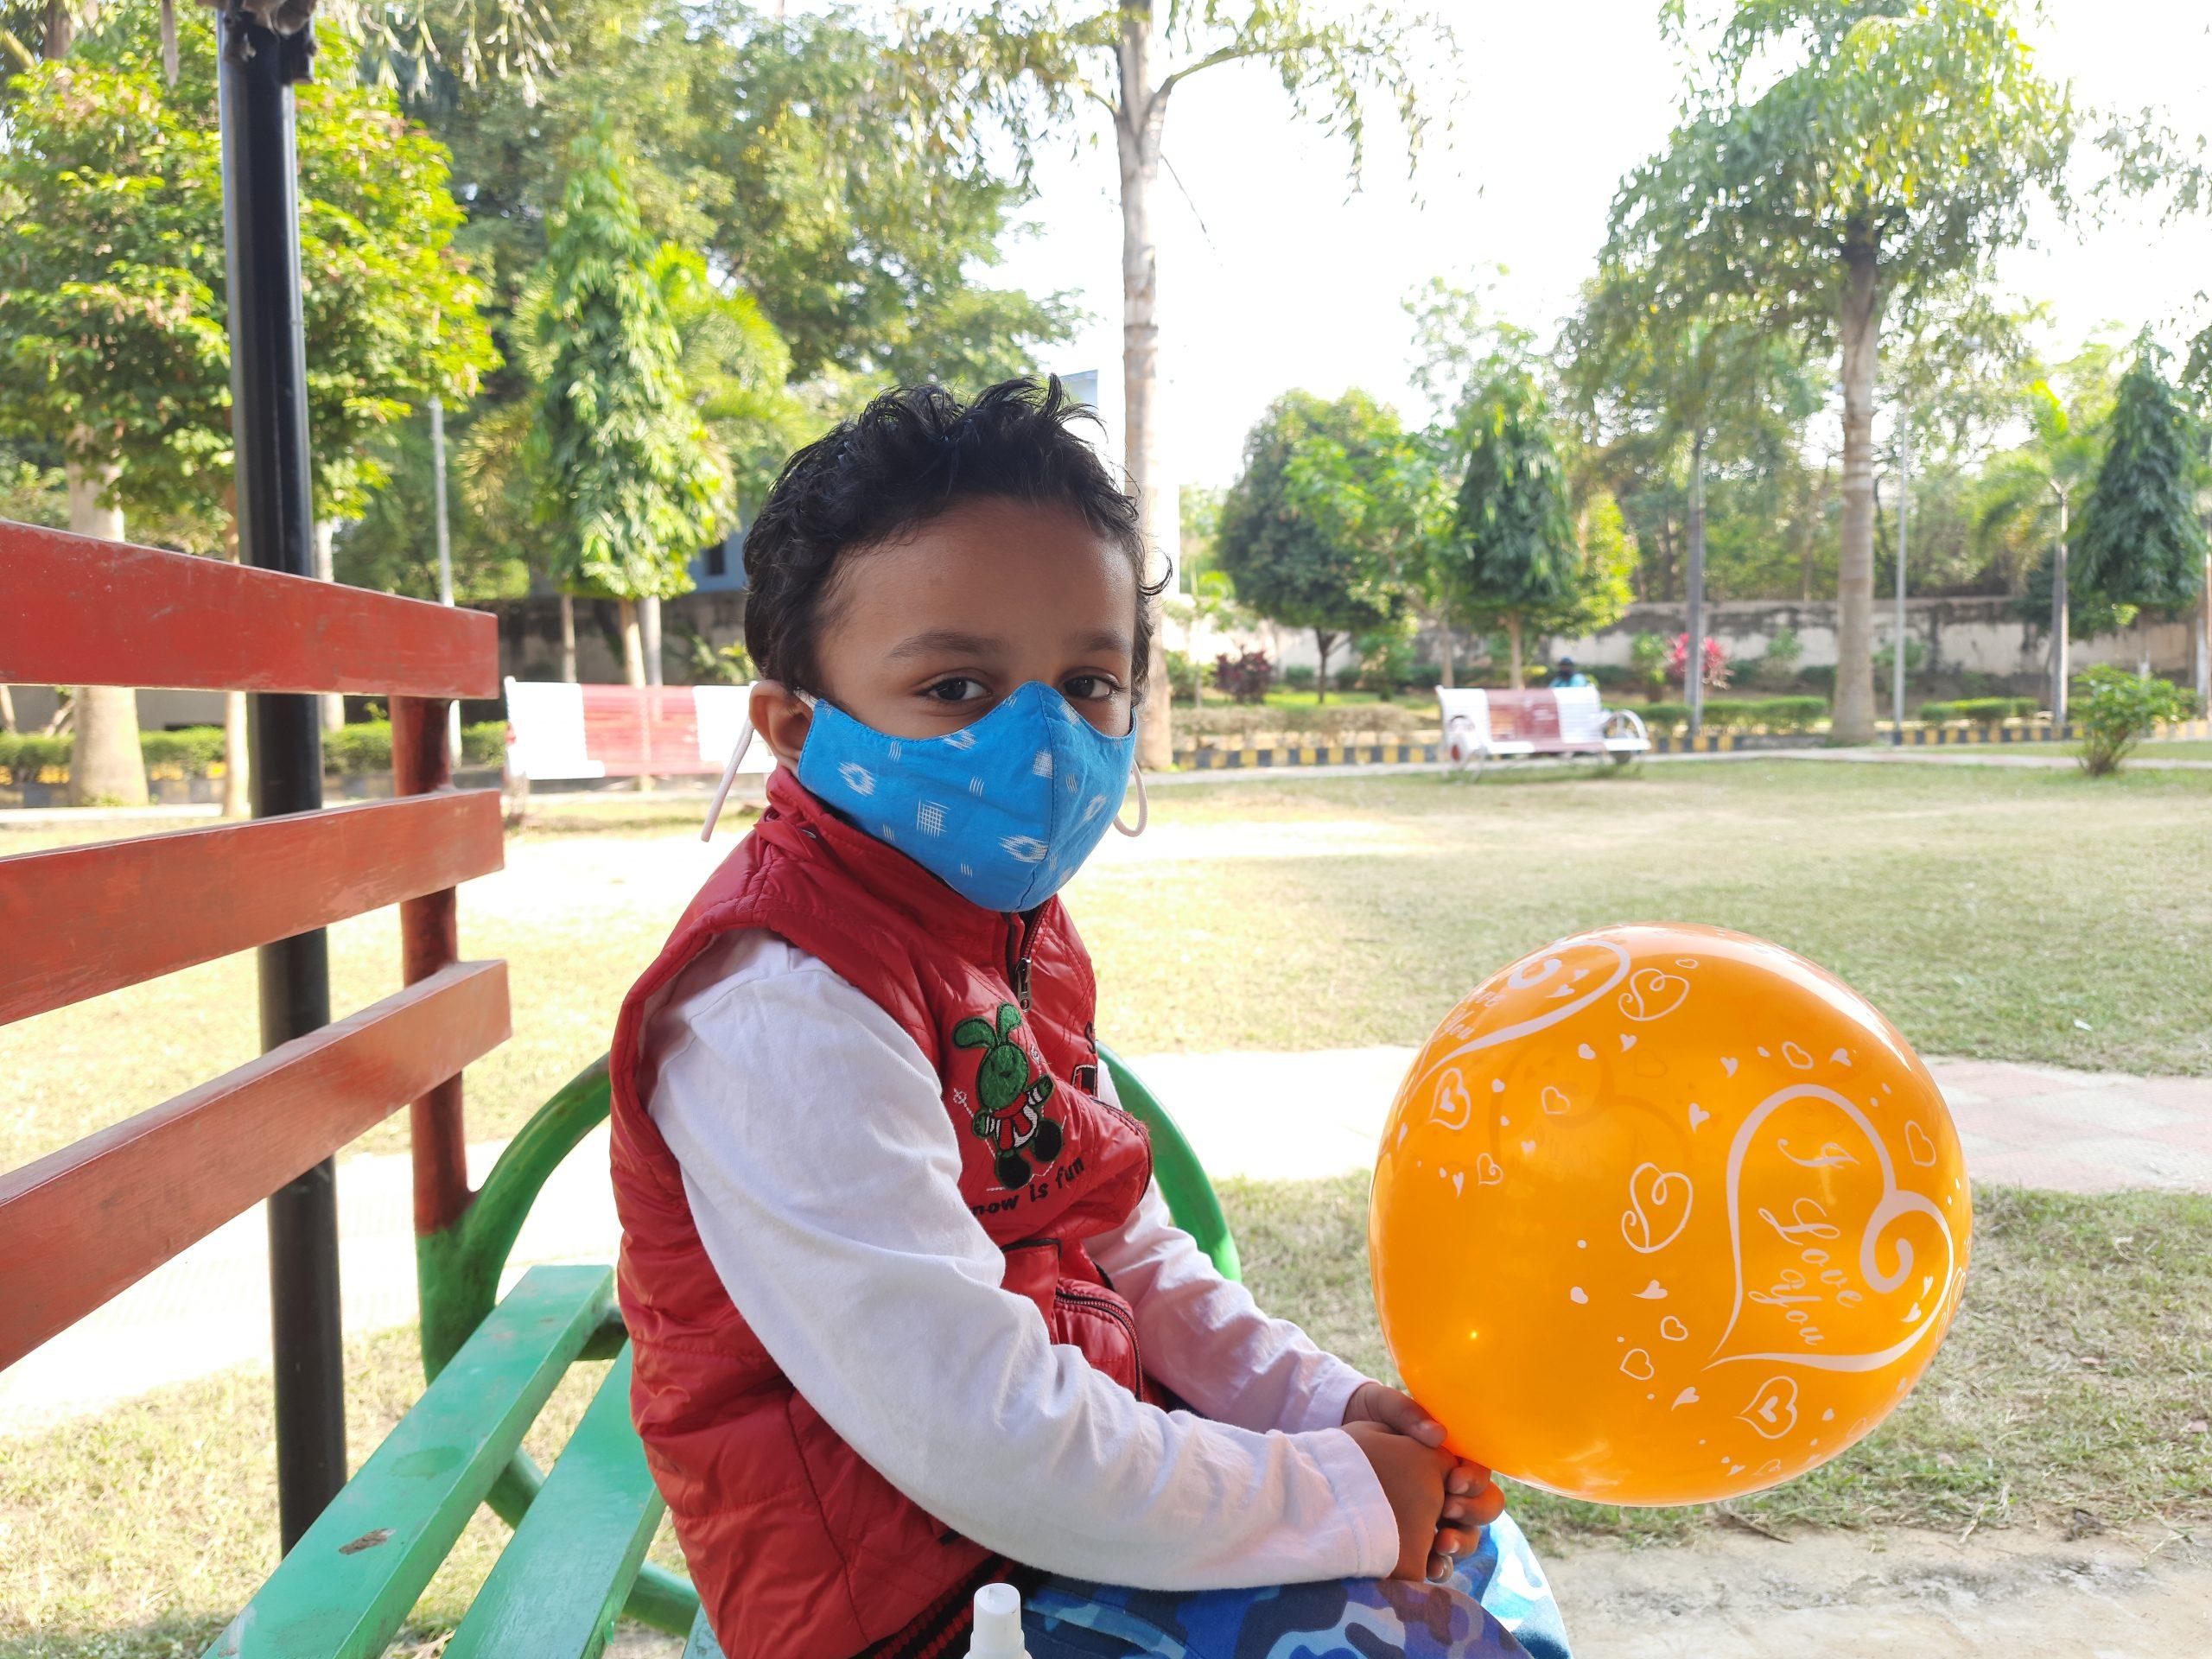 A little boy with balloon